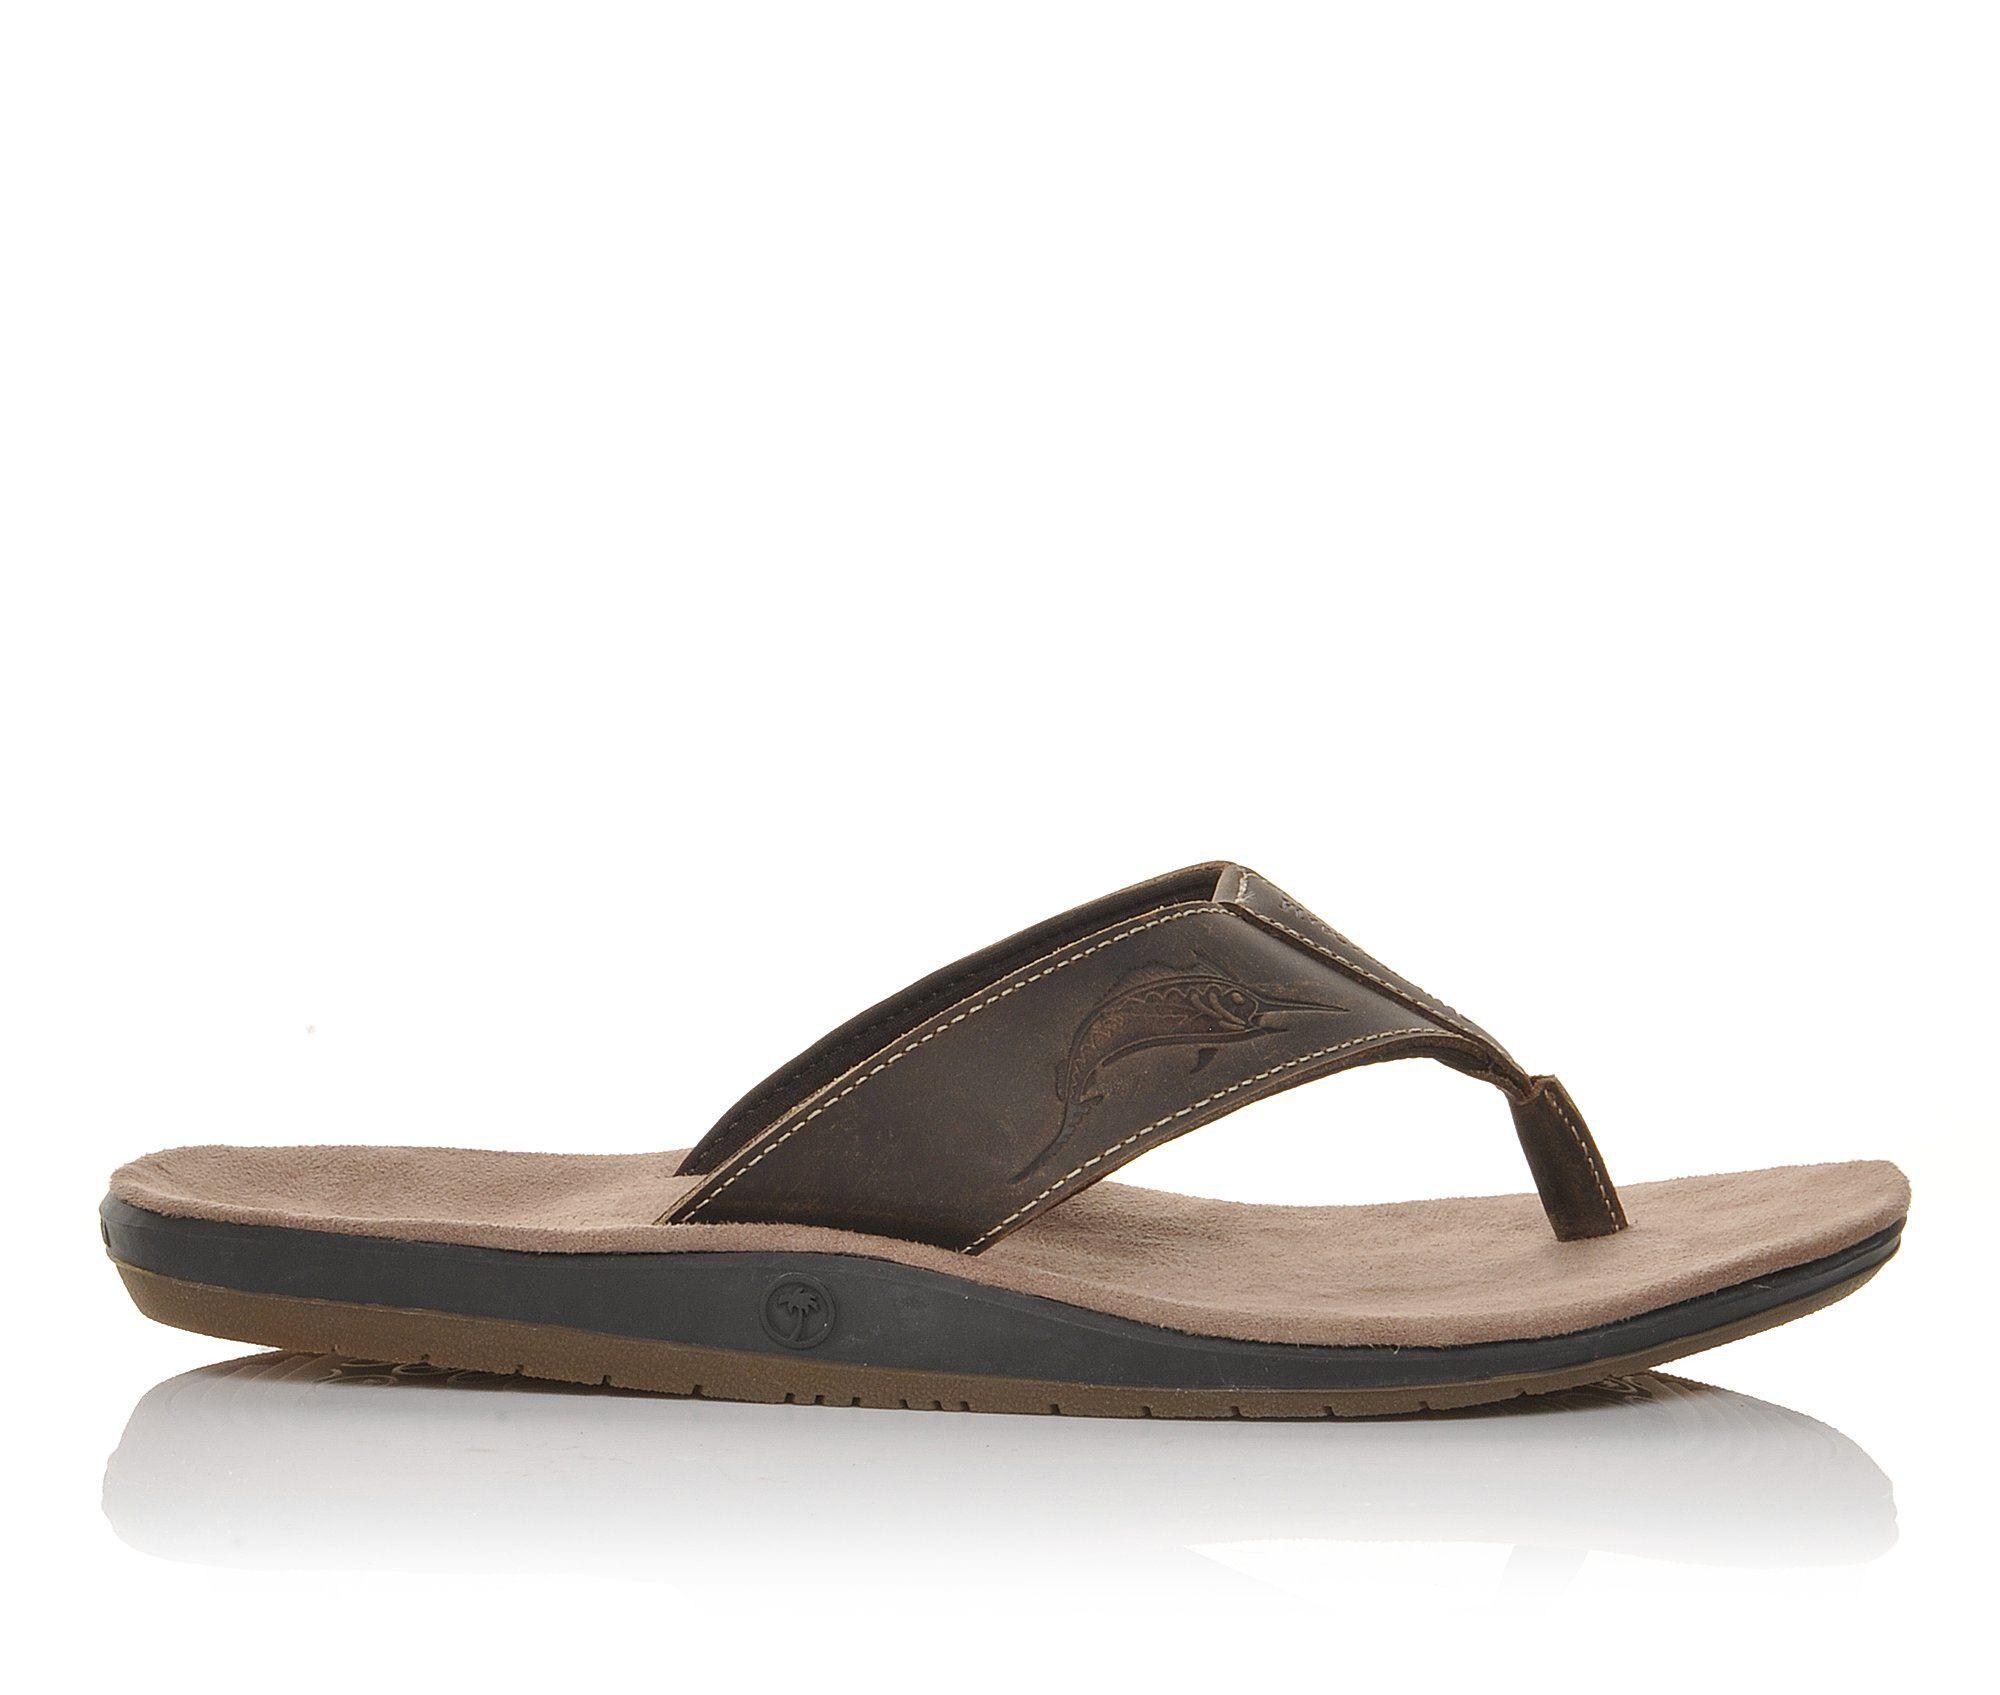 uk shoes_kd1563